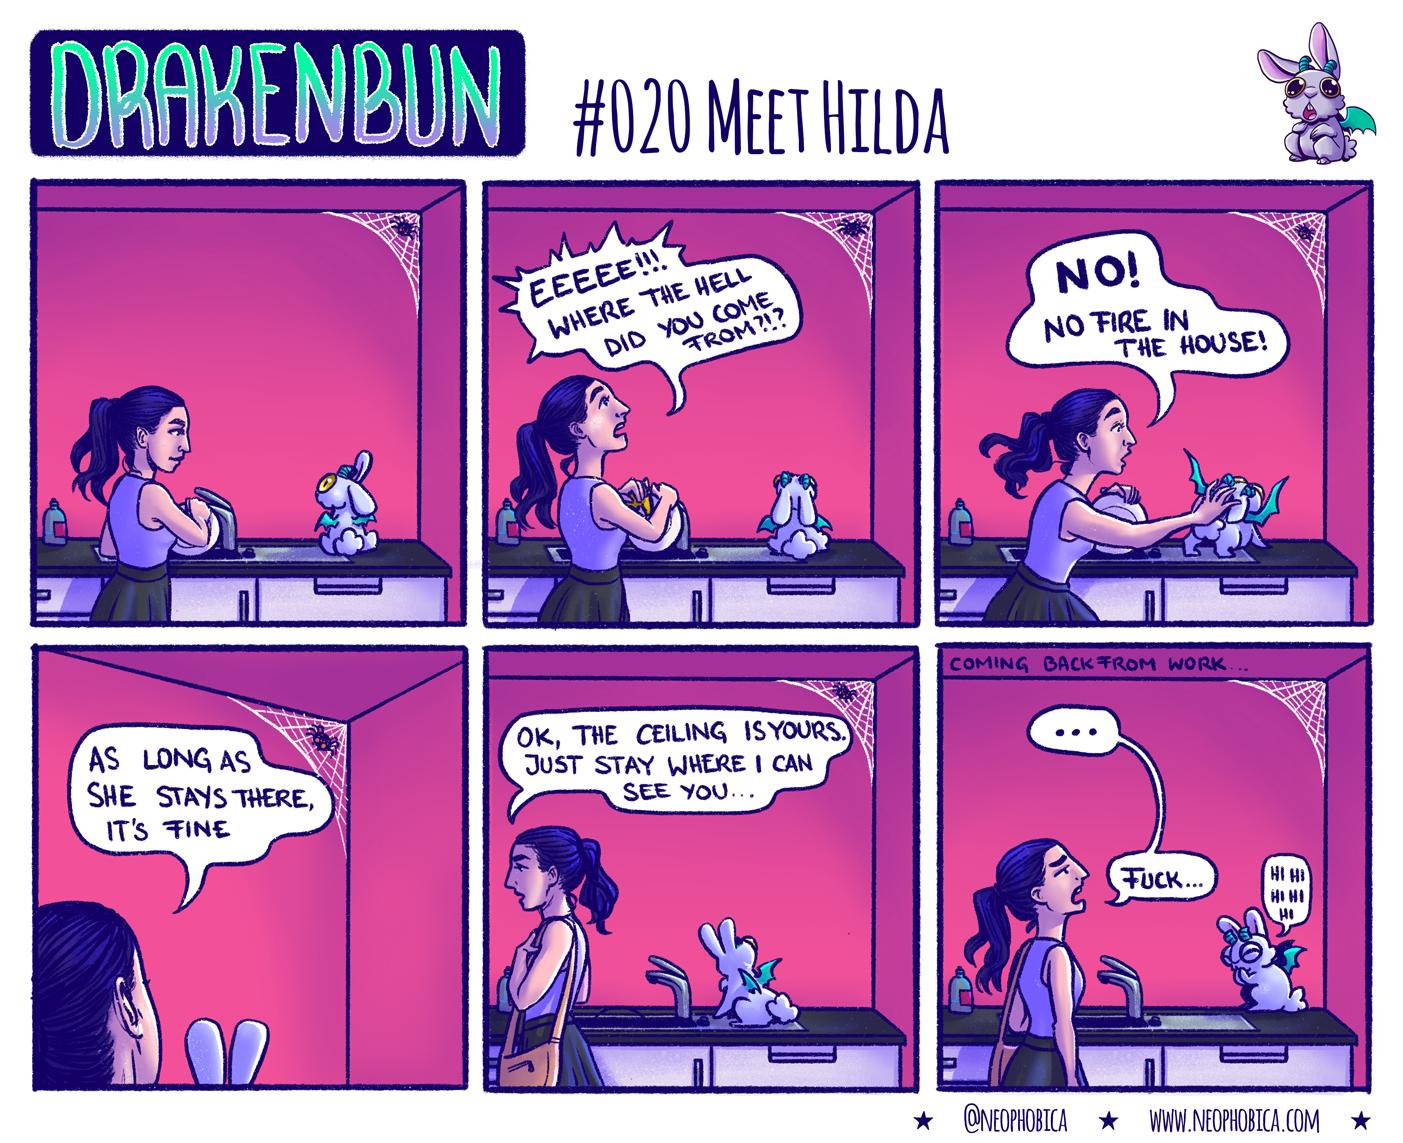 #020 Meet Hilda